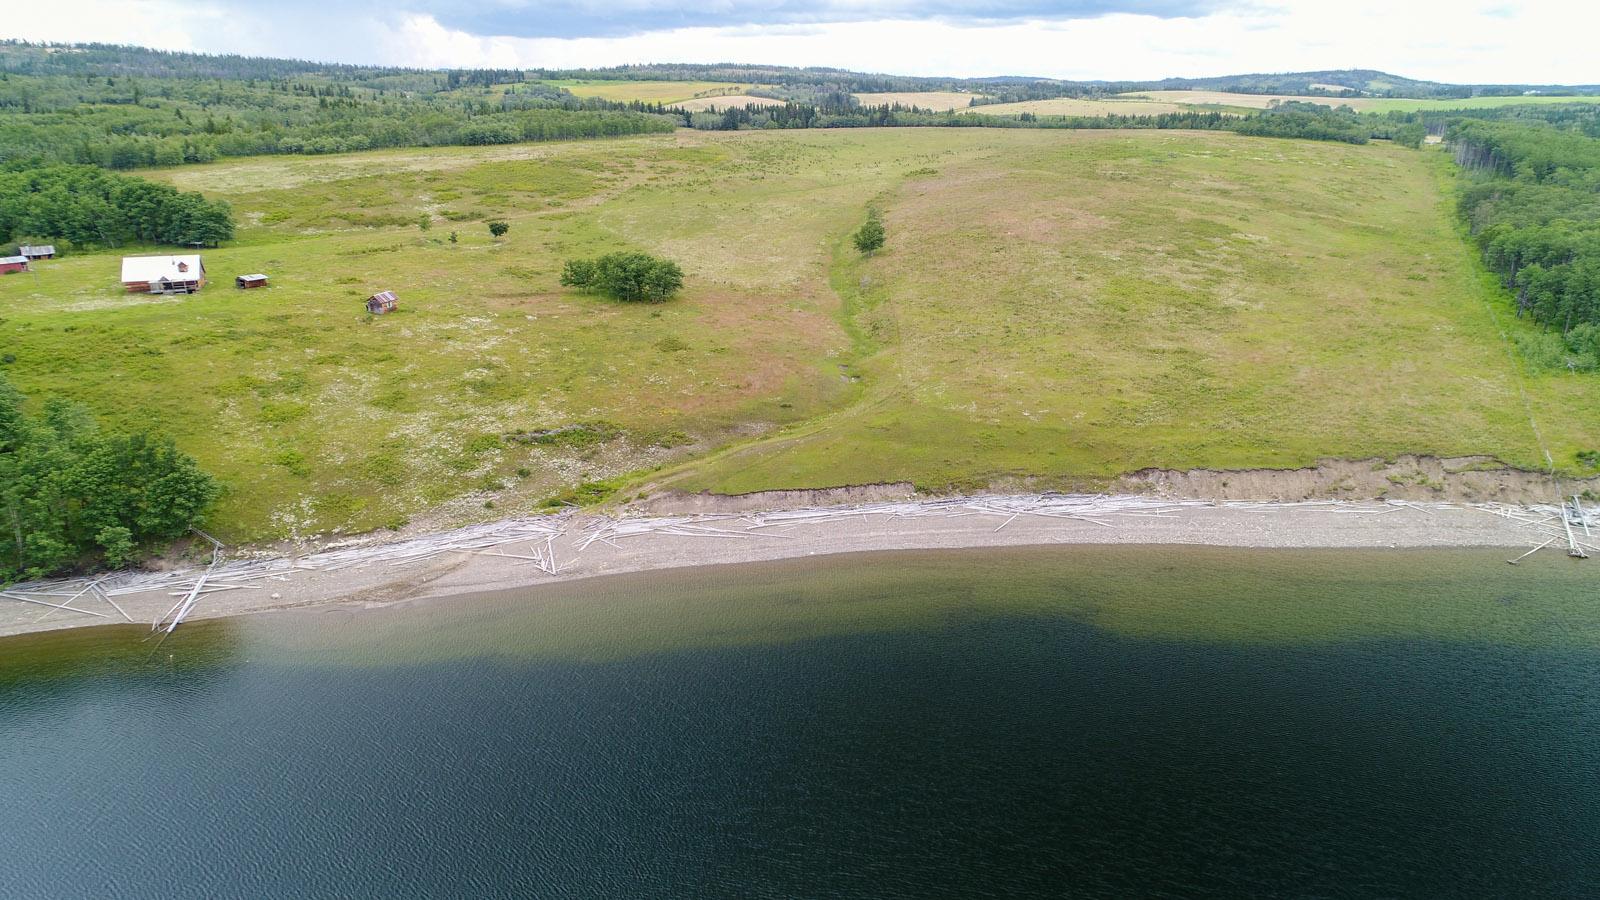 Wistaria farmland ootsa lake 03